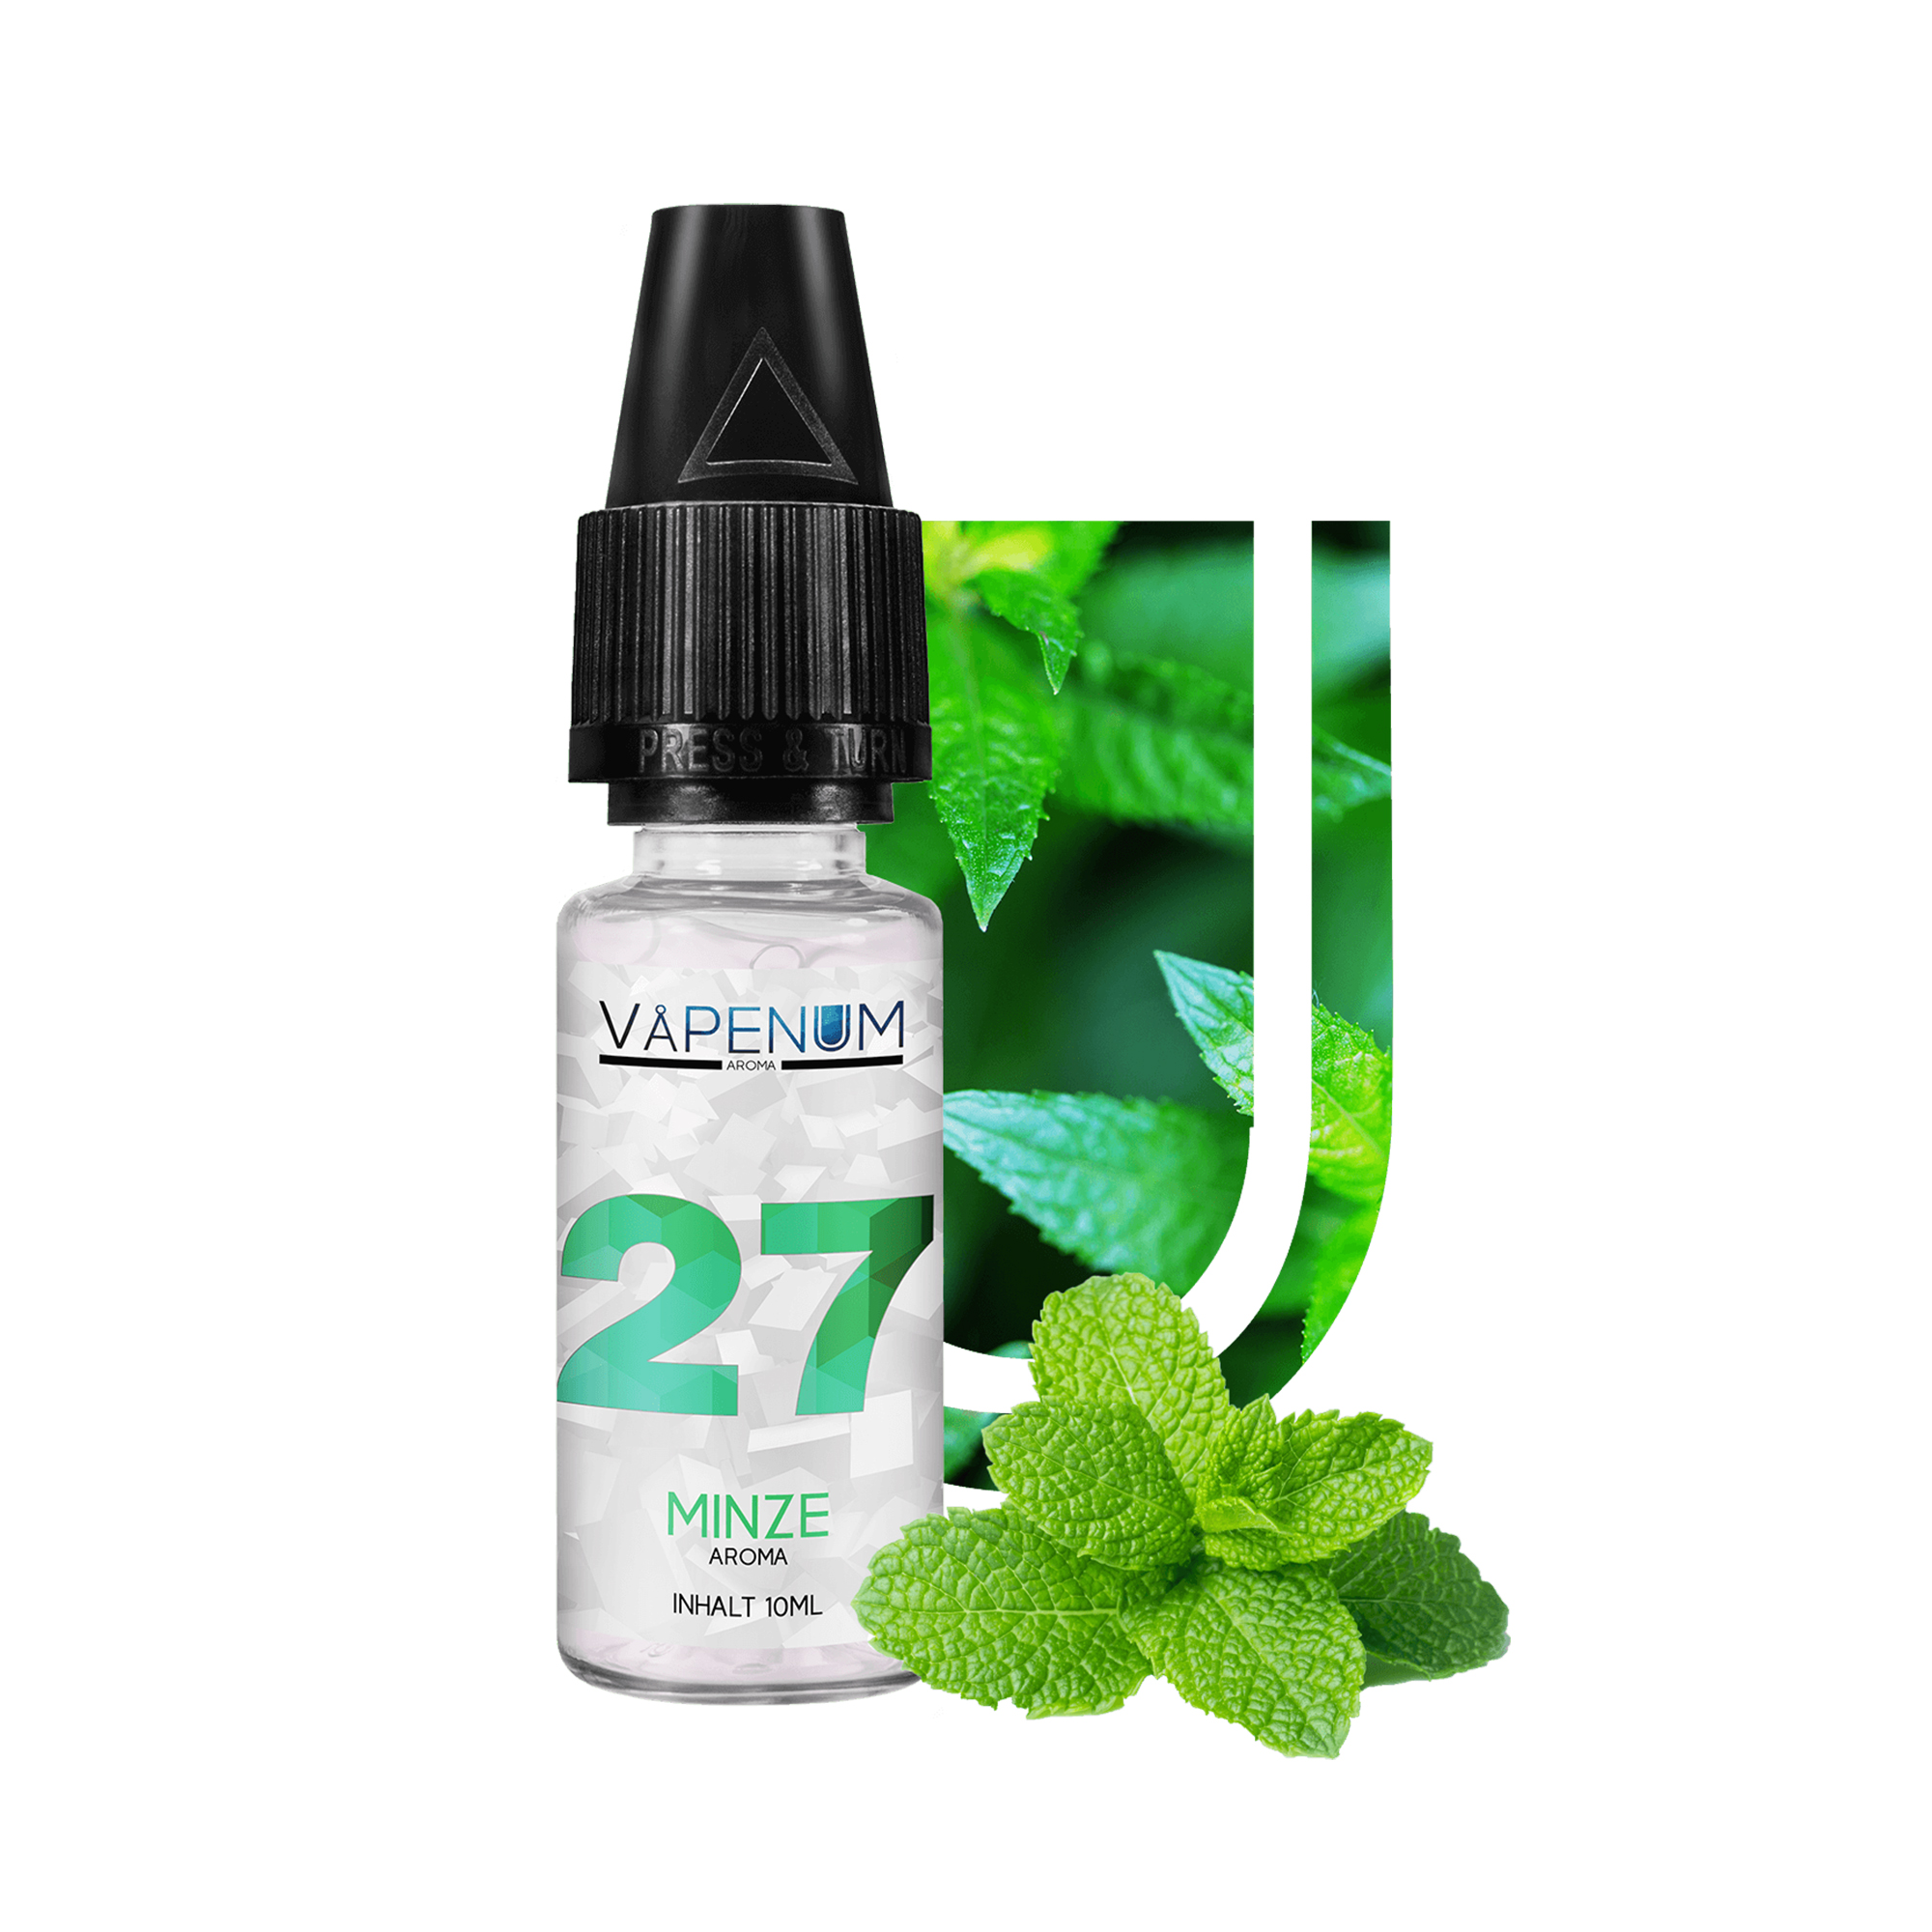 27 - Minze Aroma by Vapenum